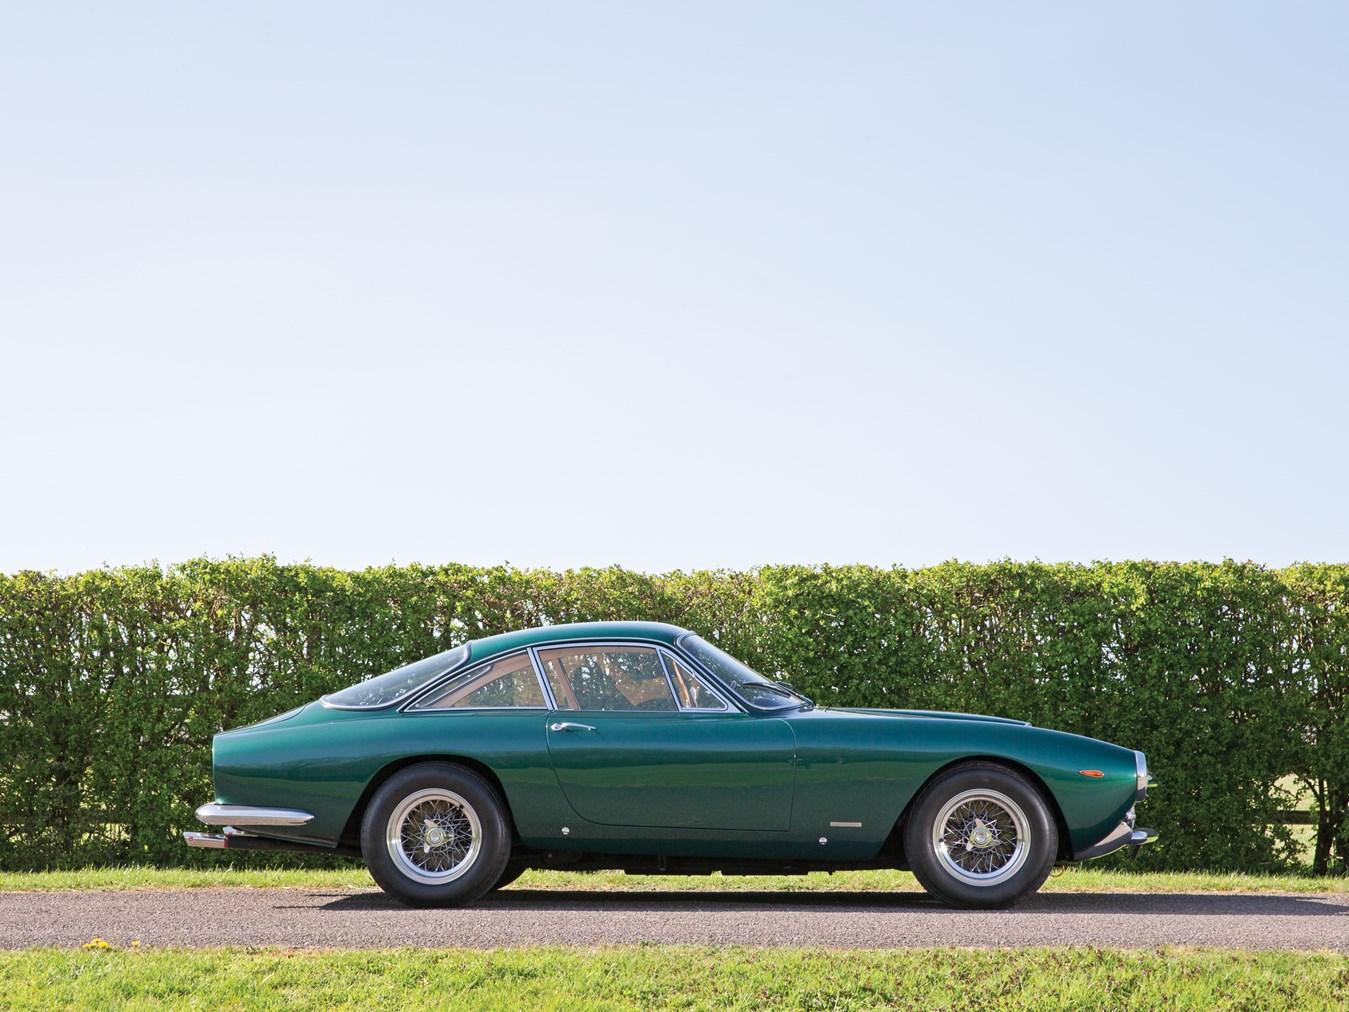 1963 Ferrari 250 GT/L Berlinetta 'Lusso' by Scaglietti